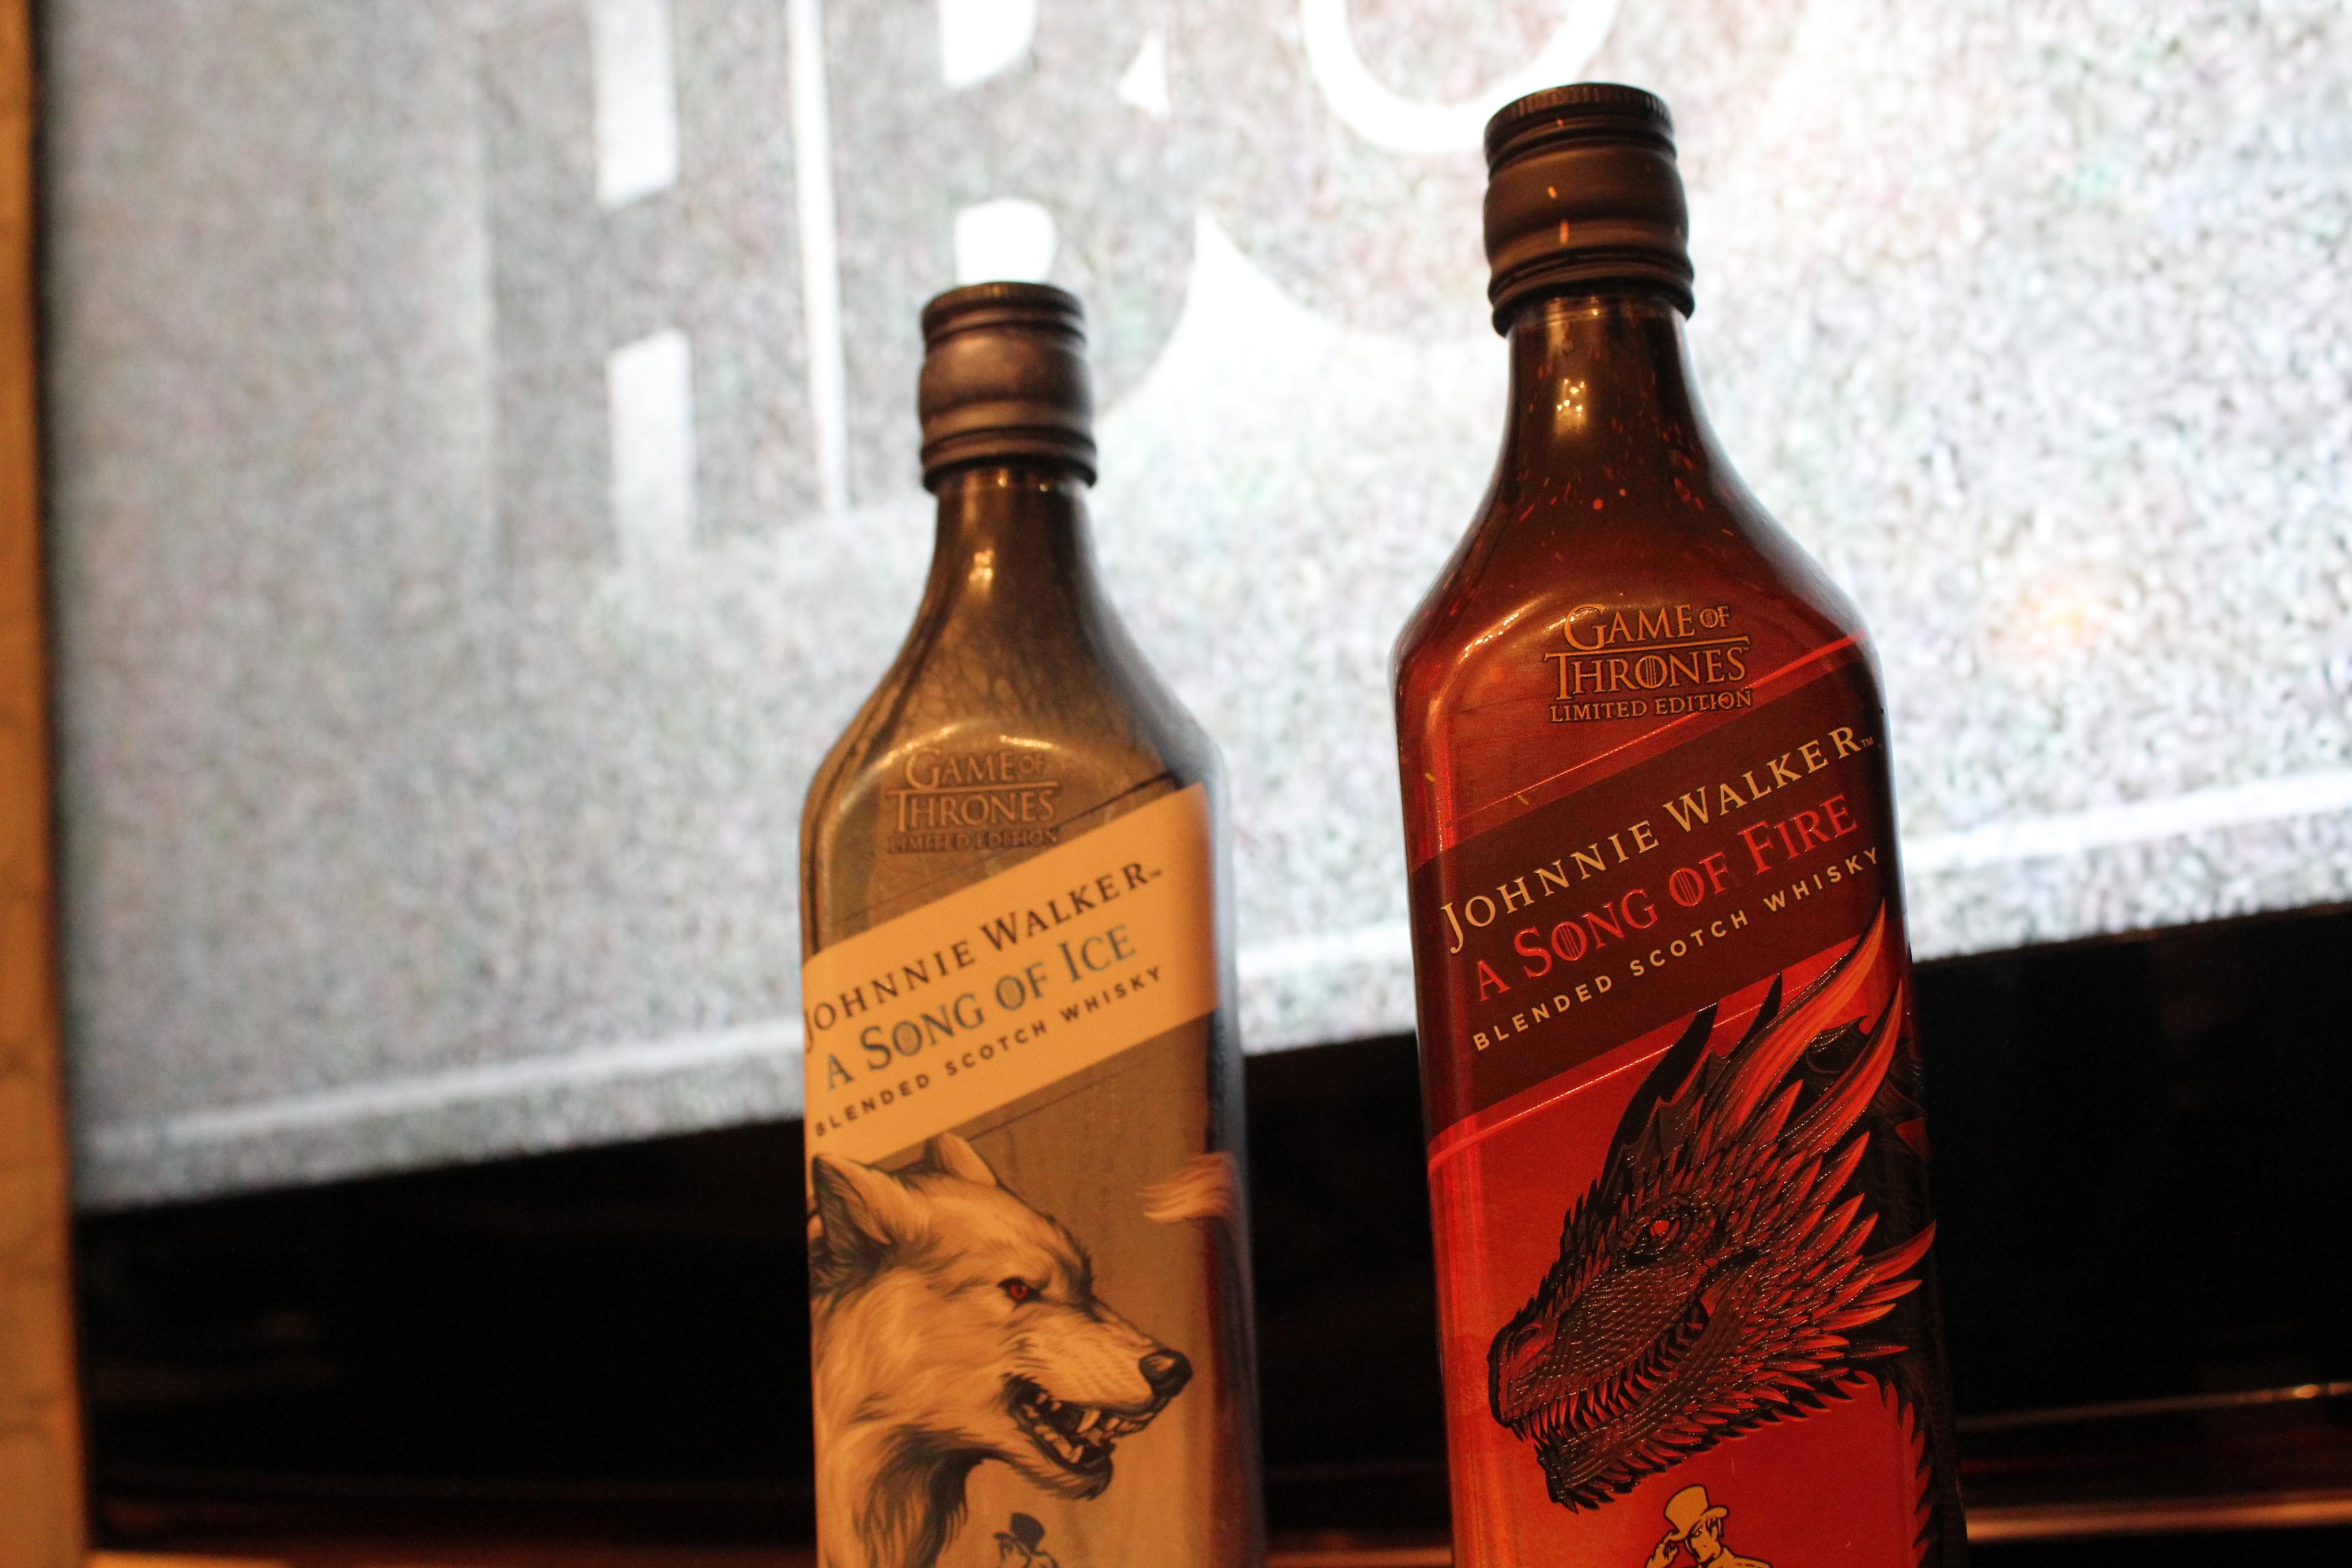 szmk_game_of_thrones_tronok_harca_johnnie_walker_whisky_scotch_tel_kozeleg_tuz_es_jeg_dala_hbo_42_masolata.JPG